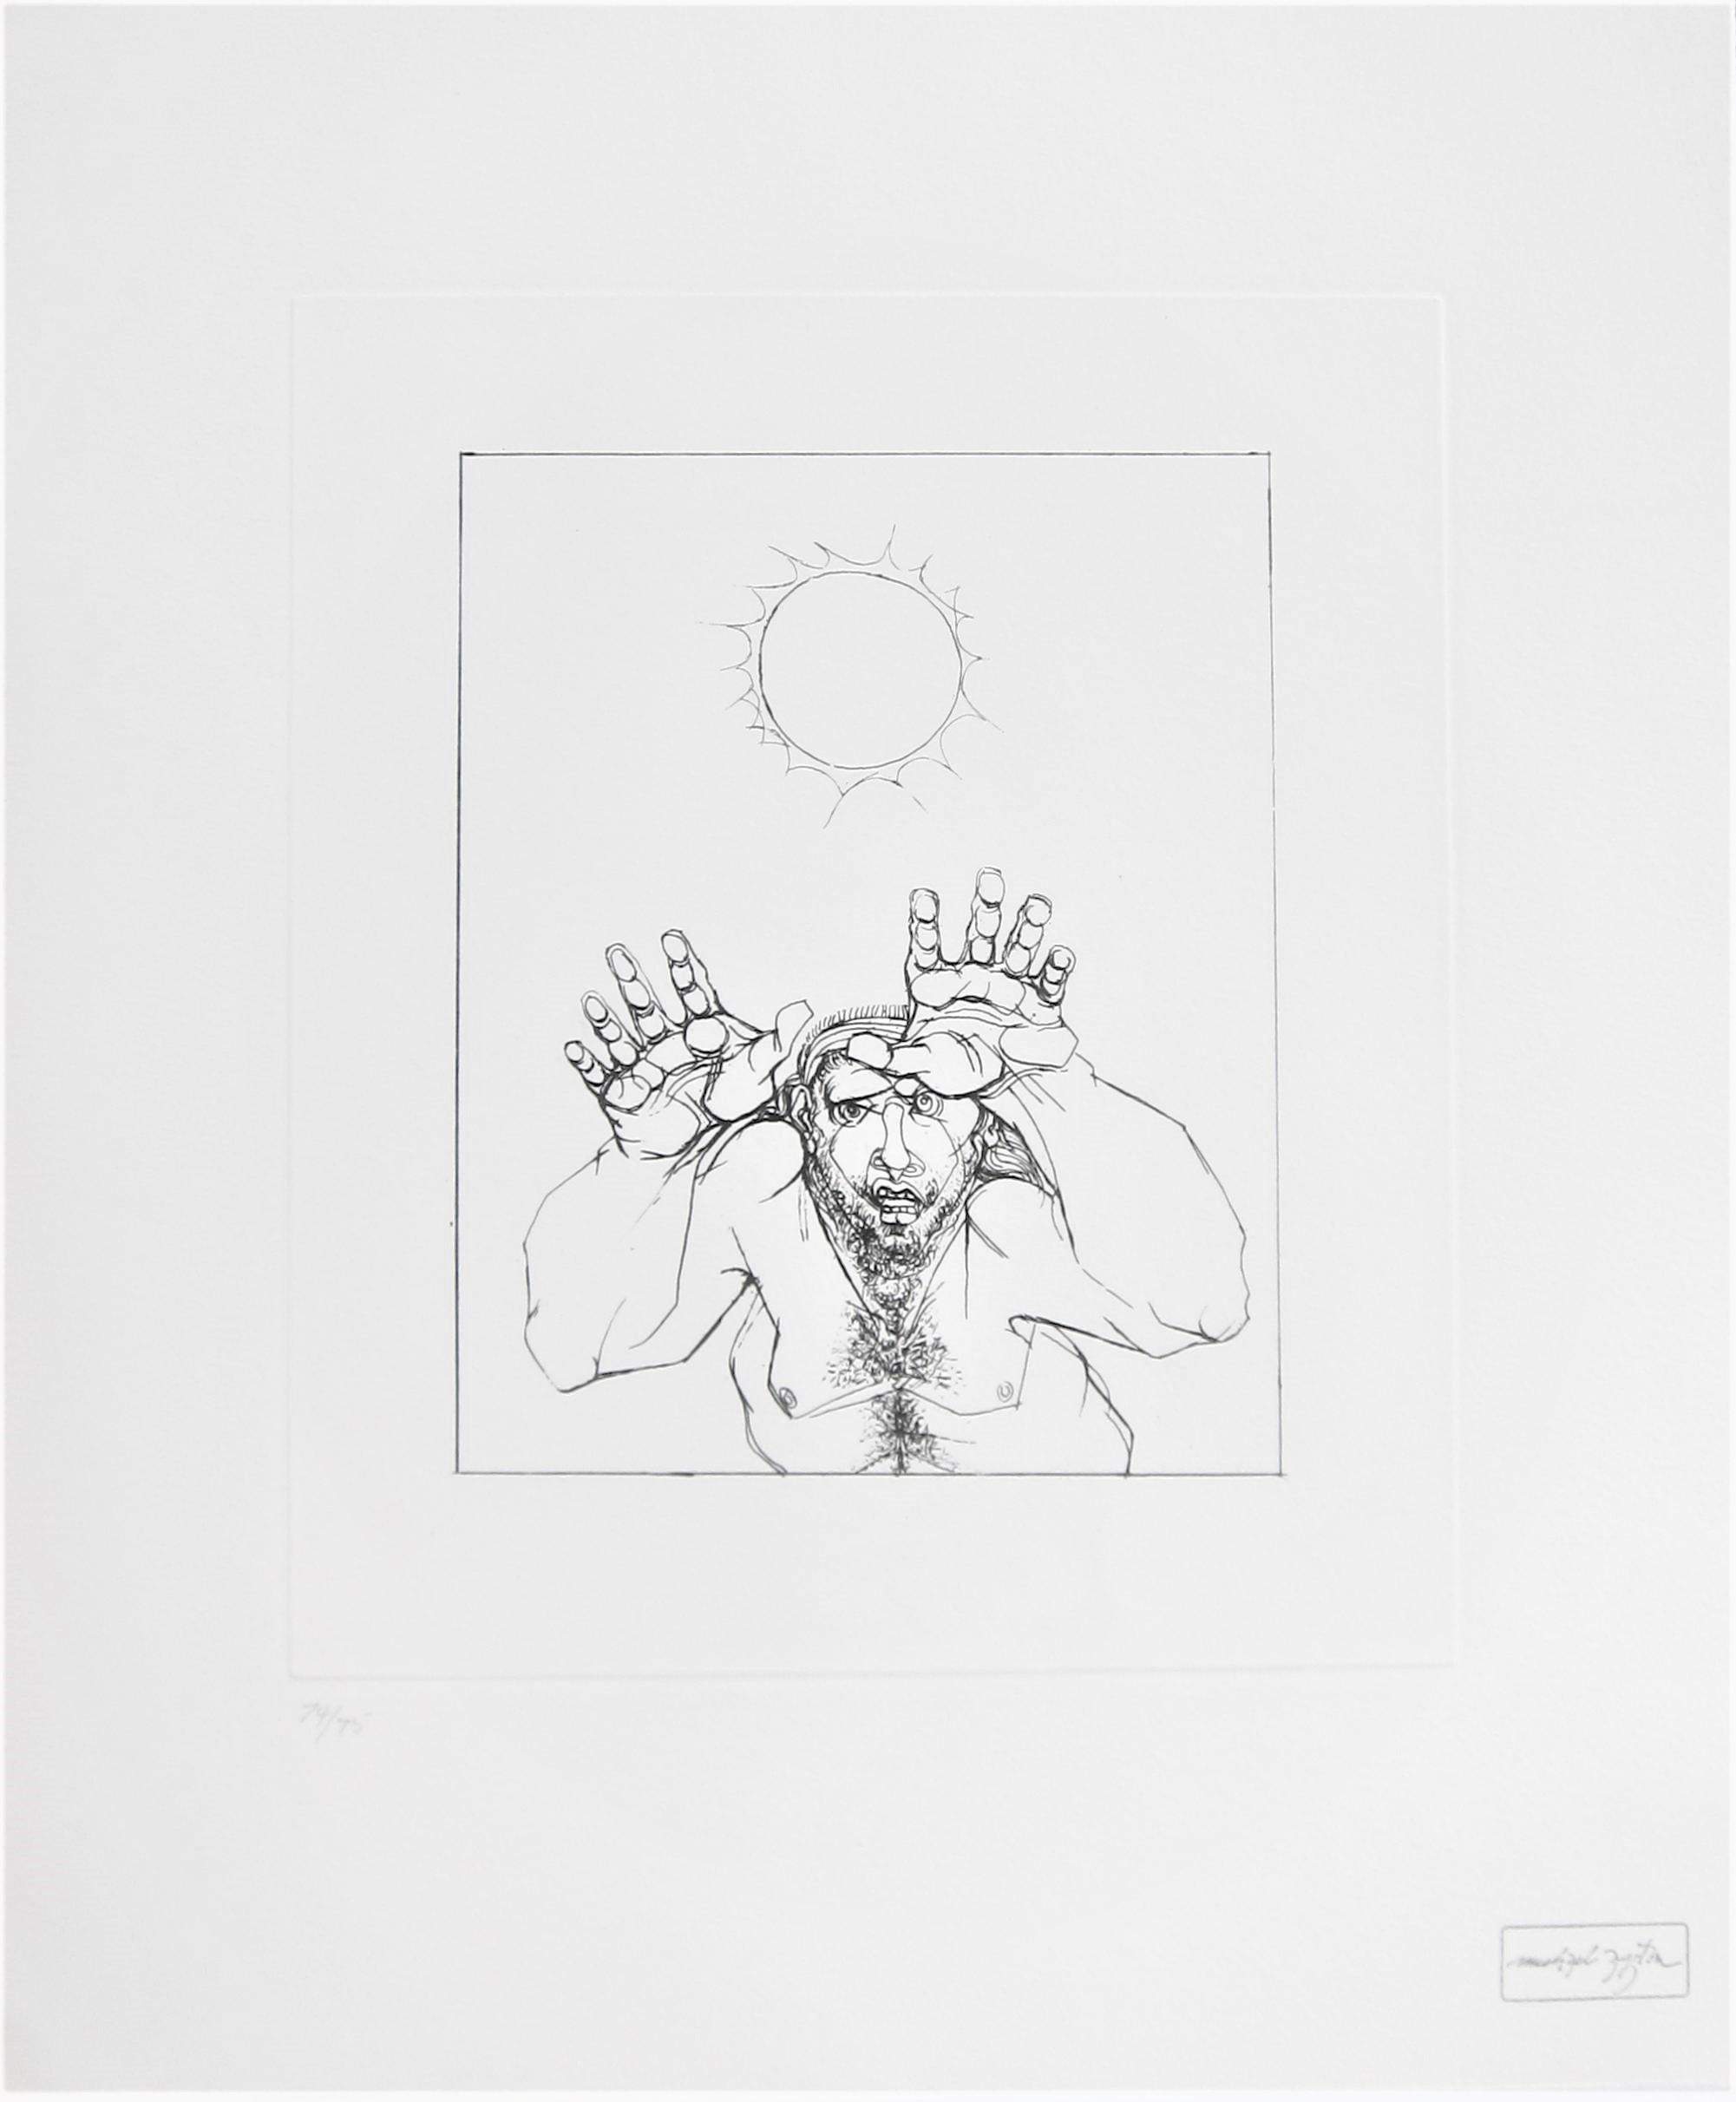 MICHAEL AYRTON [1921-75]. Archilochos Eclipse, 1975. etching, edition of 75, 66/75; studio stamp